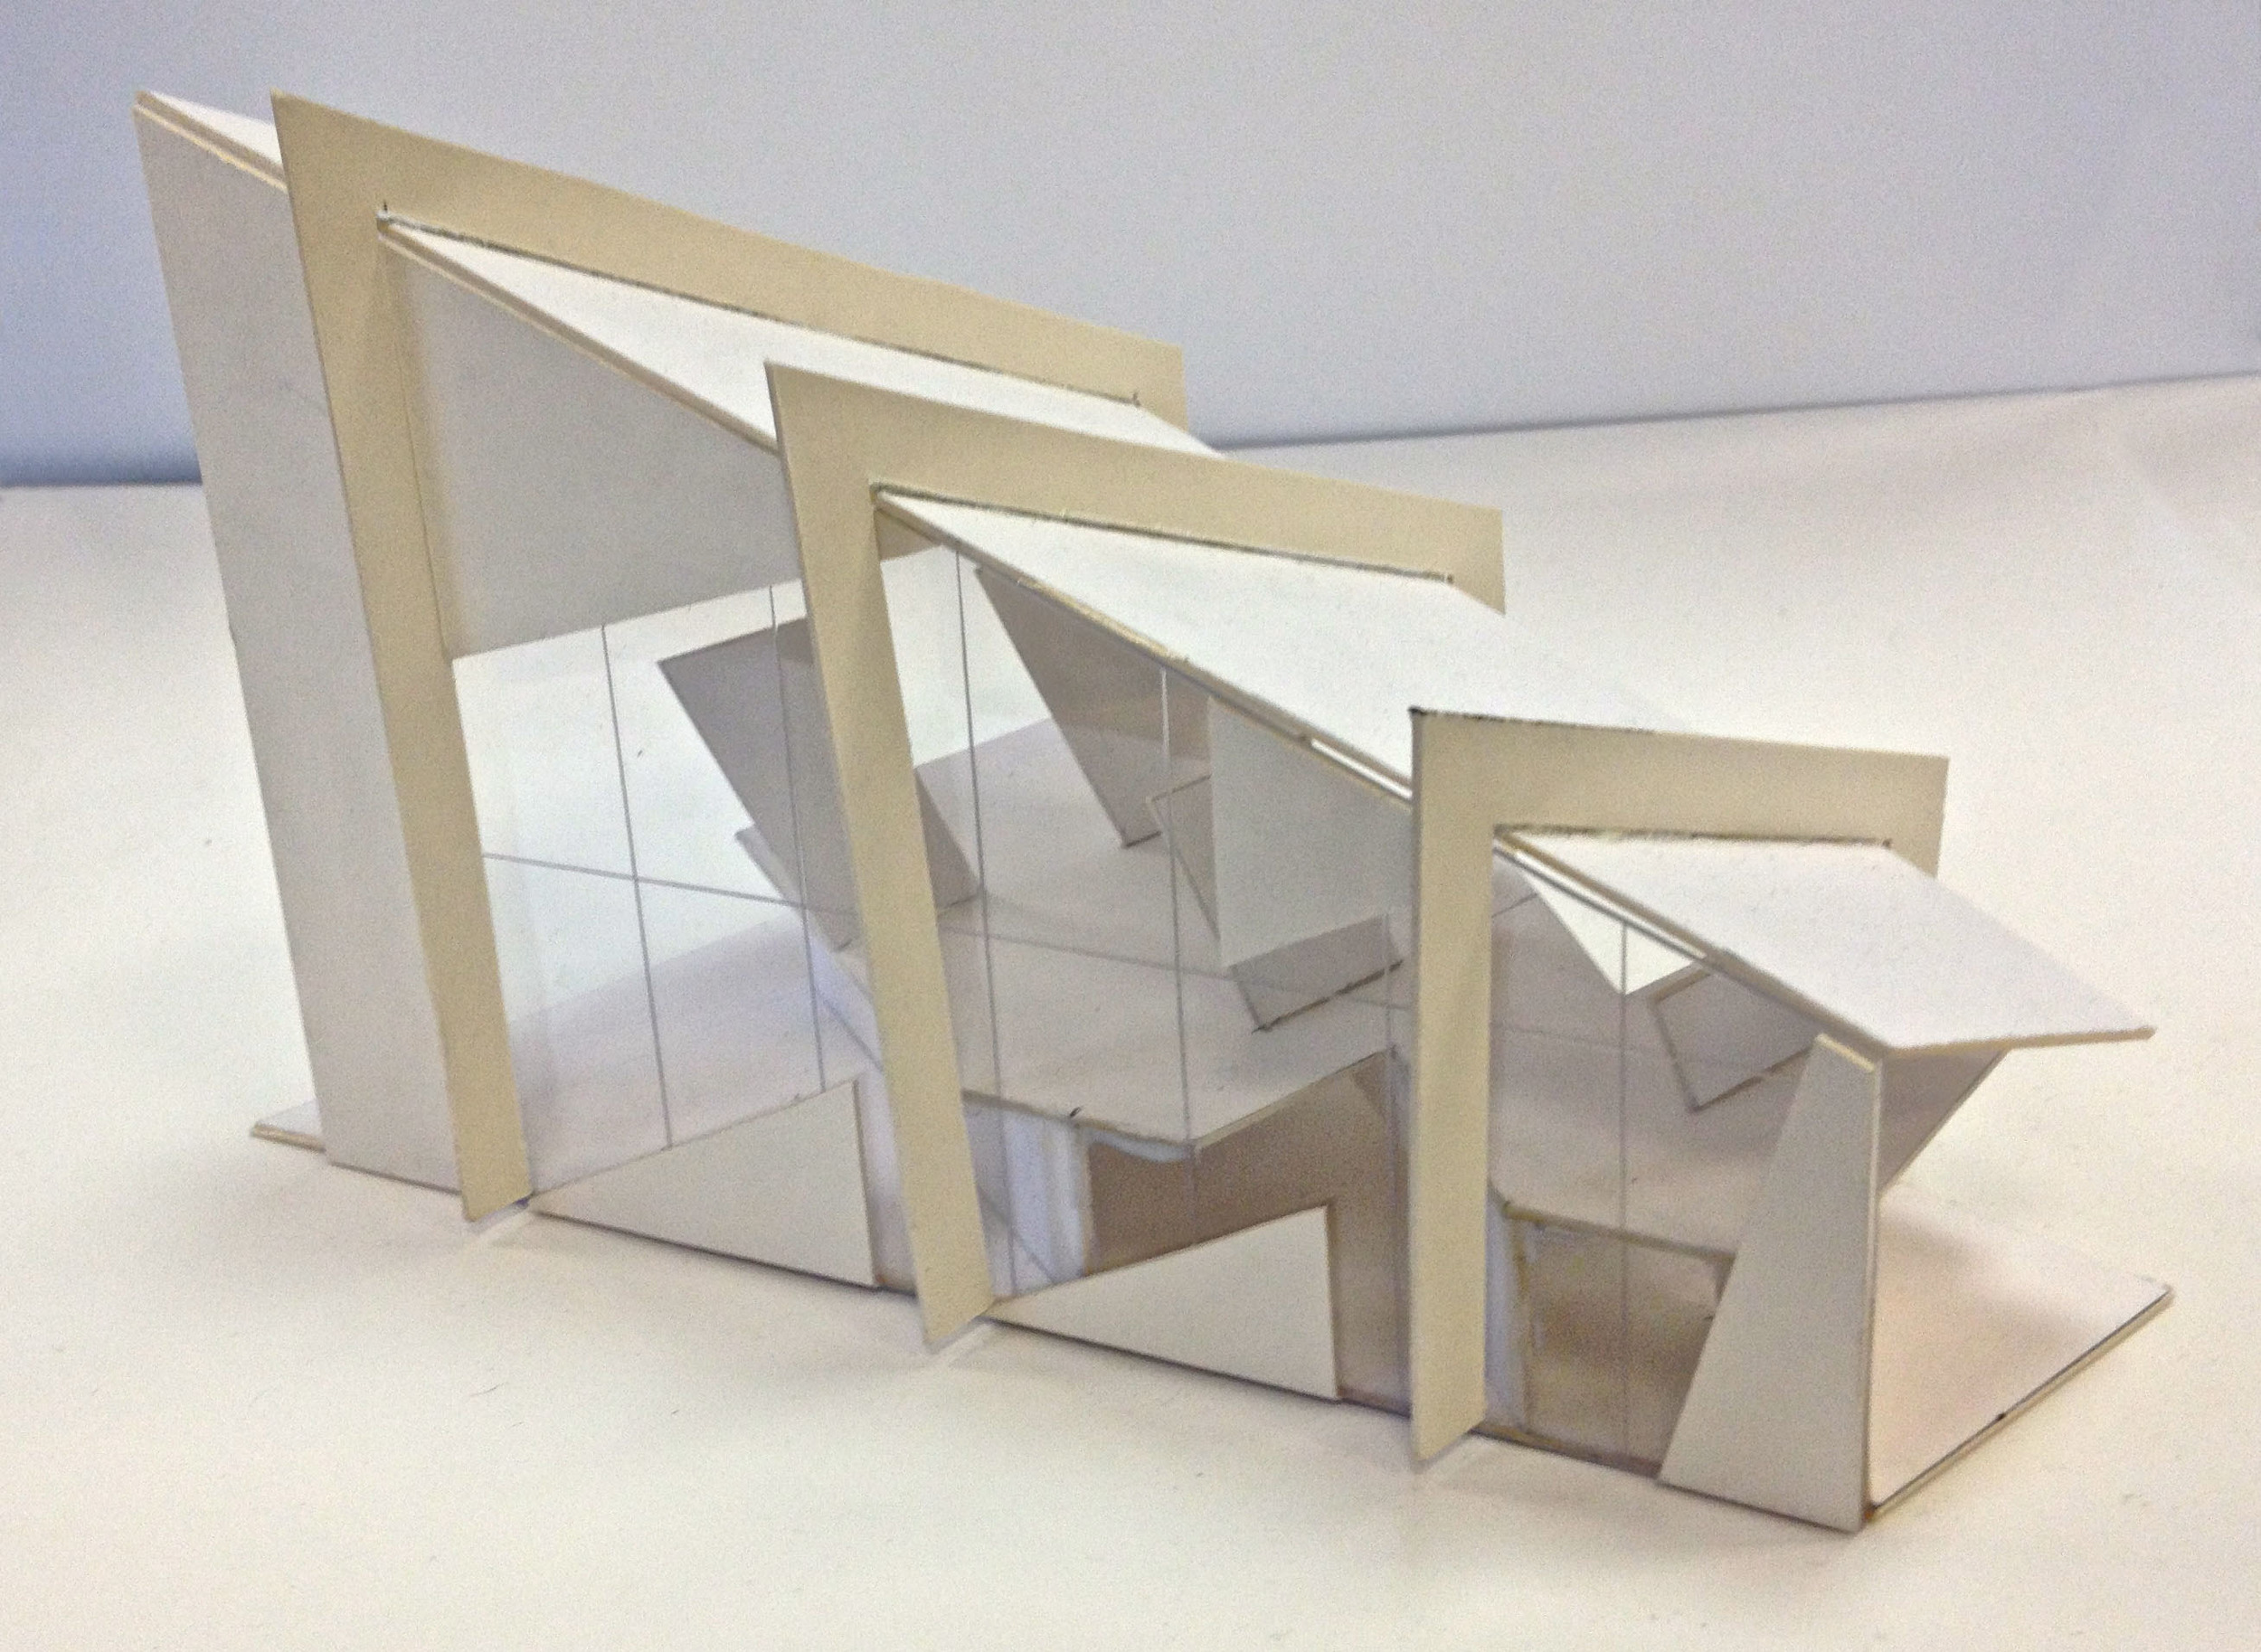 Studio Process Work Study Models Jeff Sargis